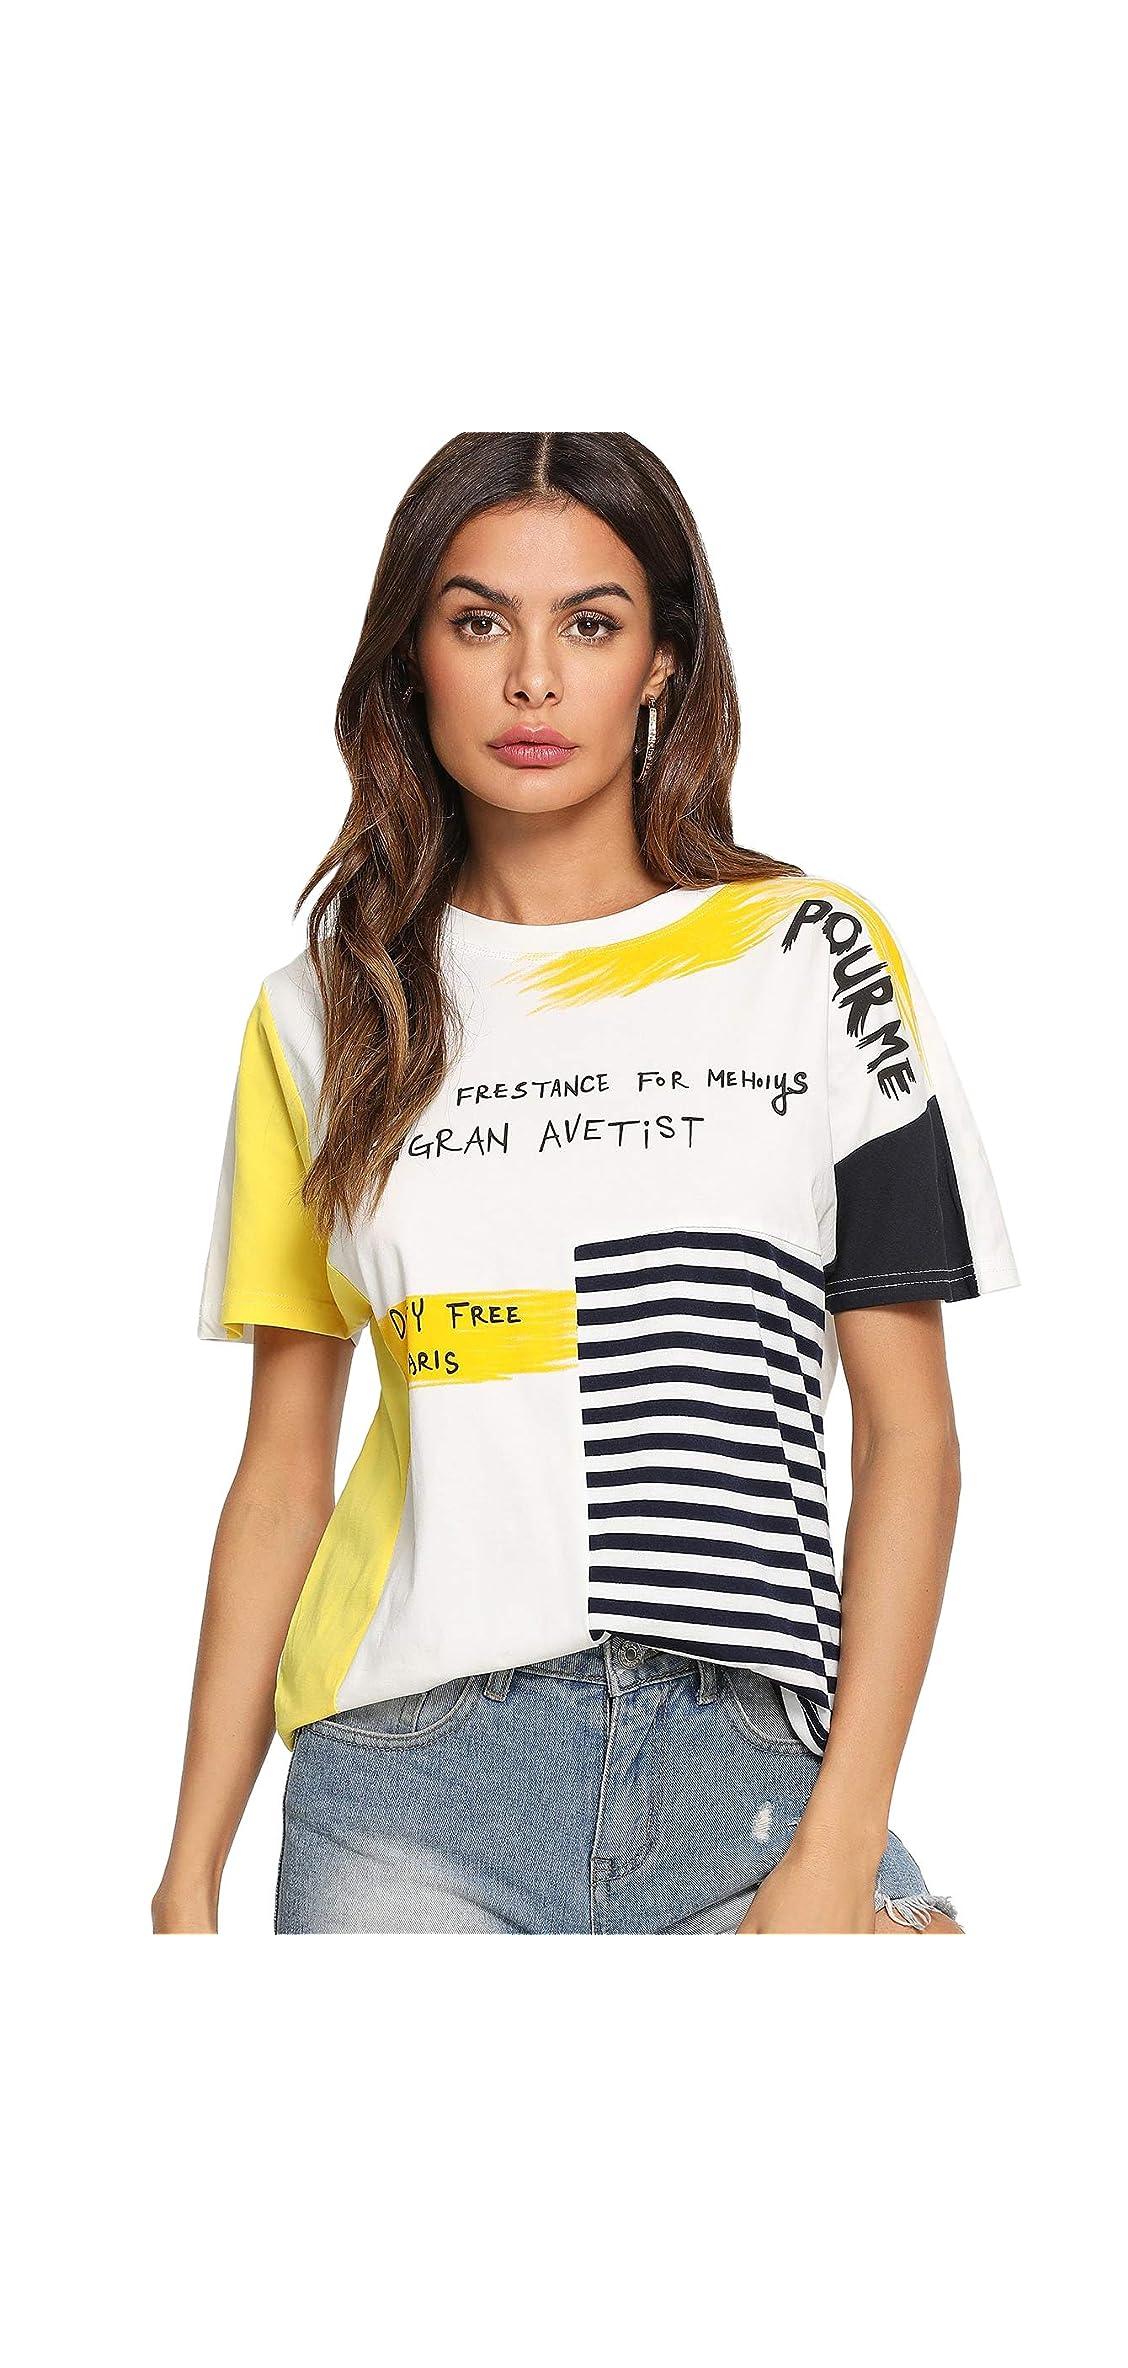 Women's Graphic Cute Short Sleeve Crewneck T-shirt Casual